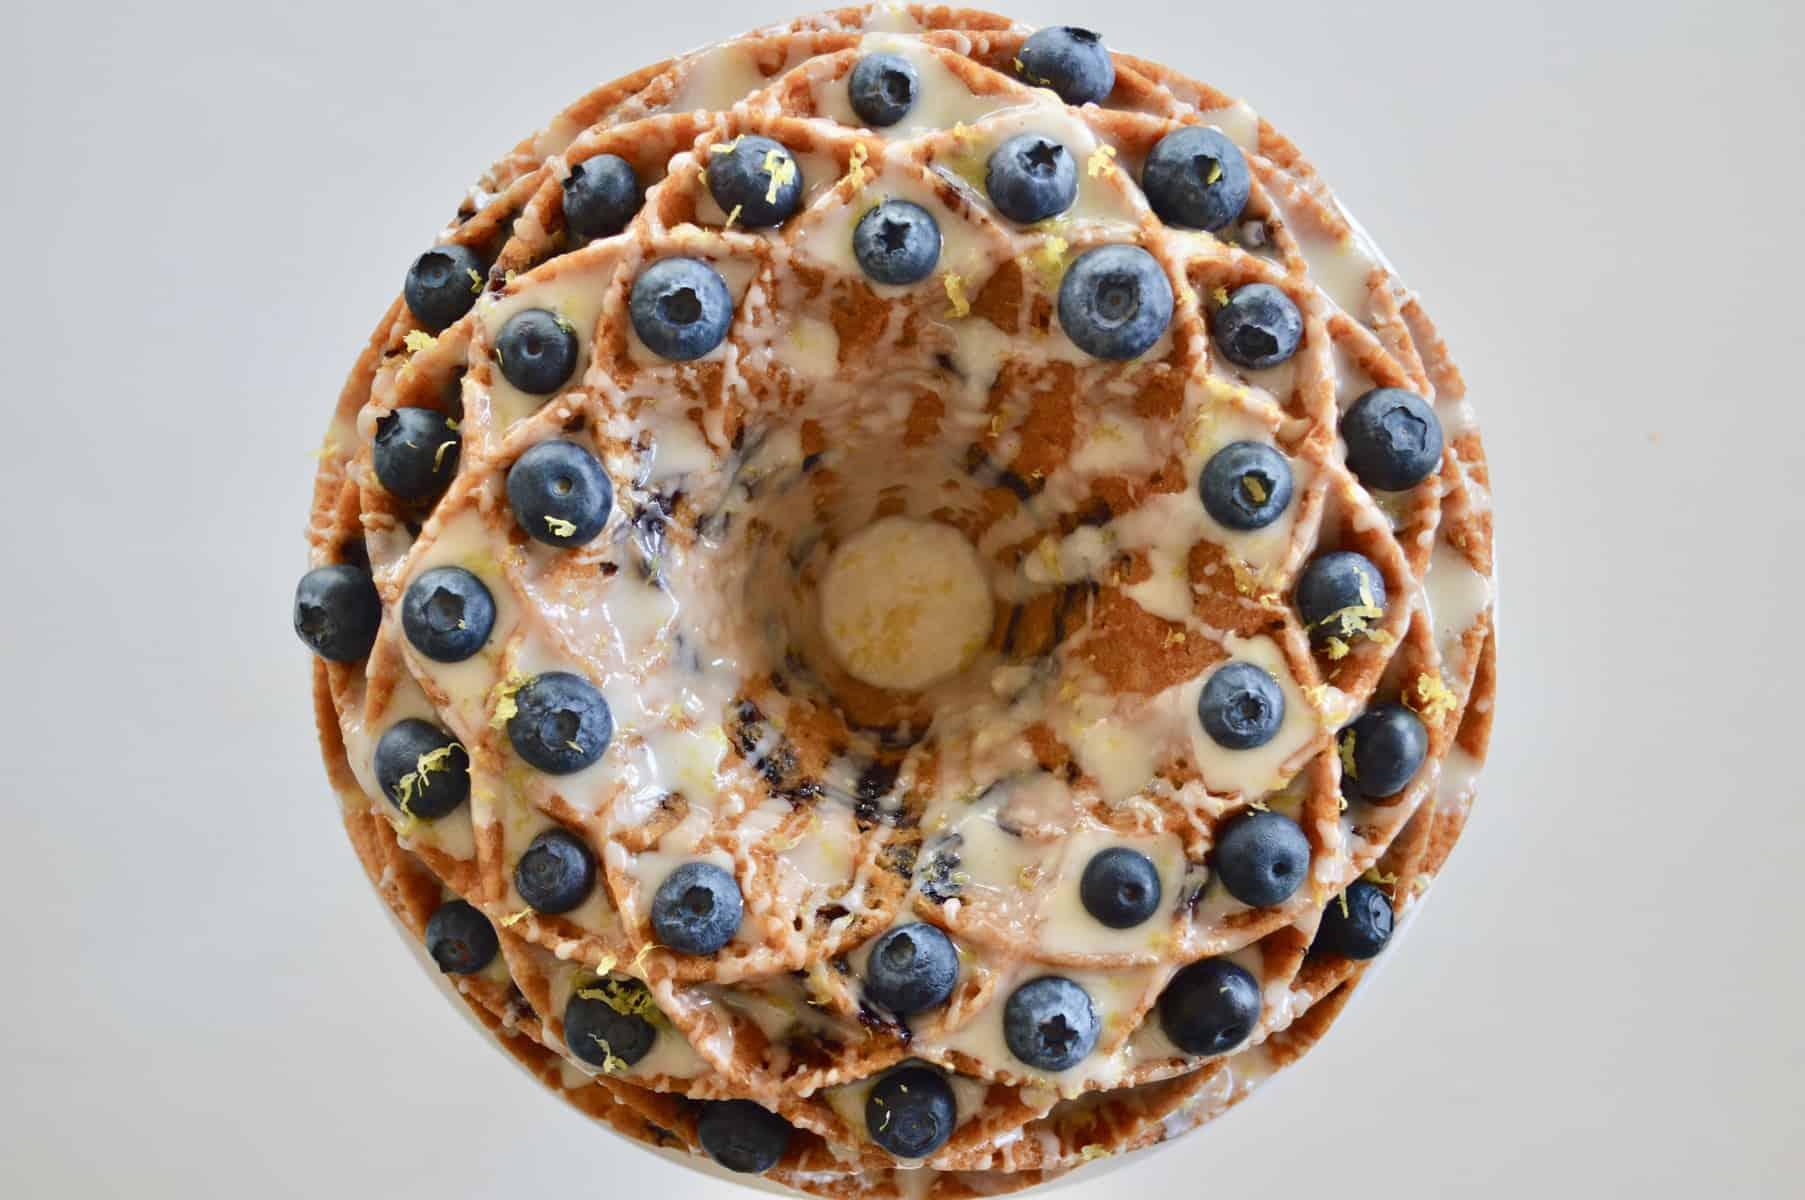 blueberry lemon bundt cake make in a jubilee cake pan